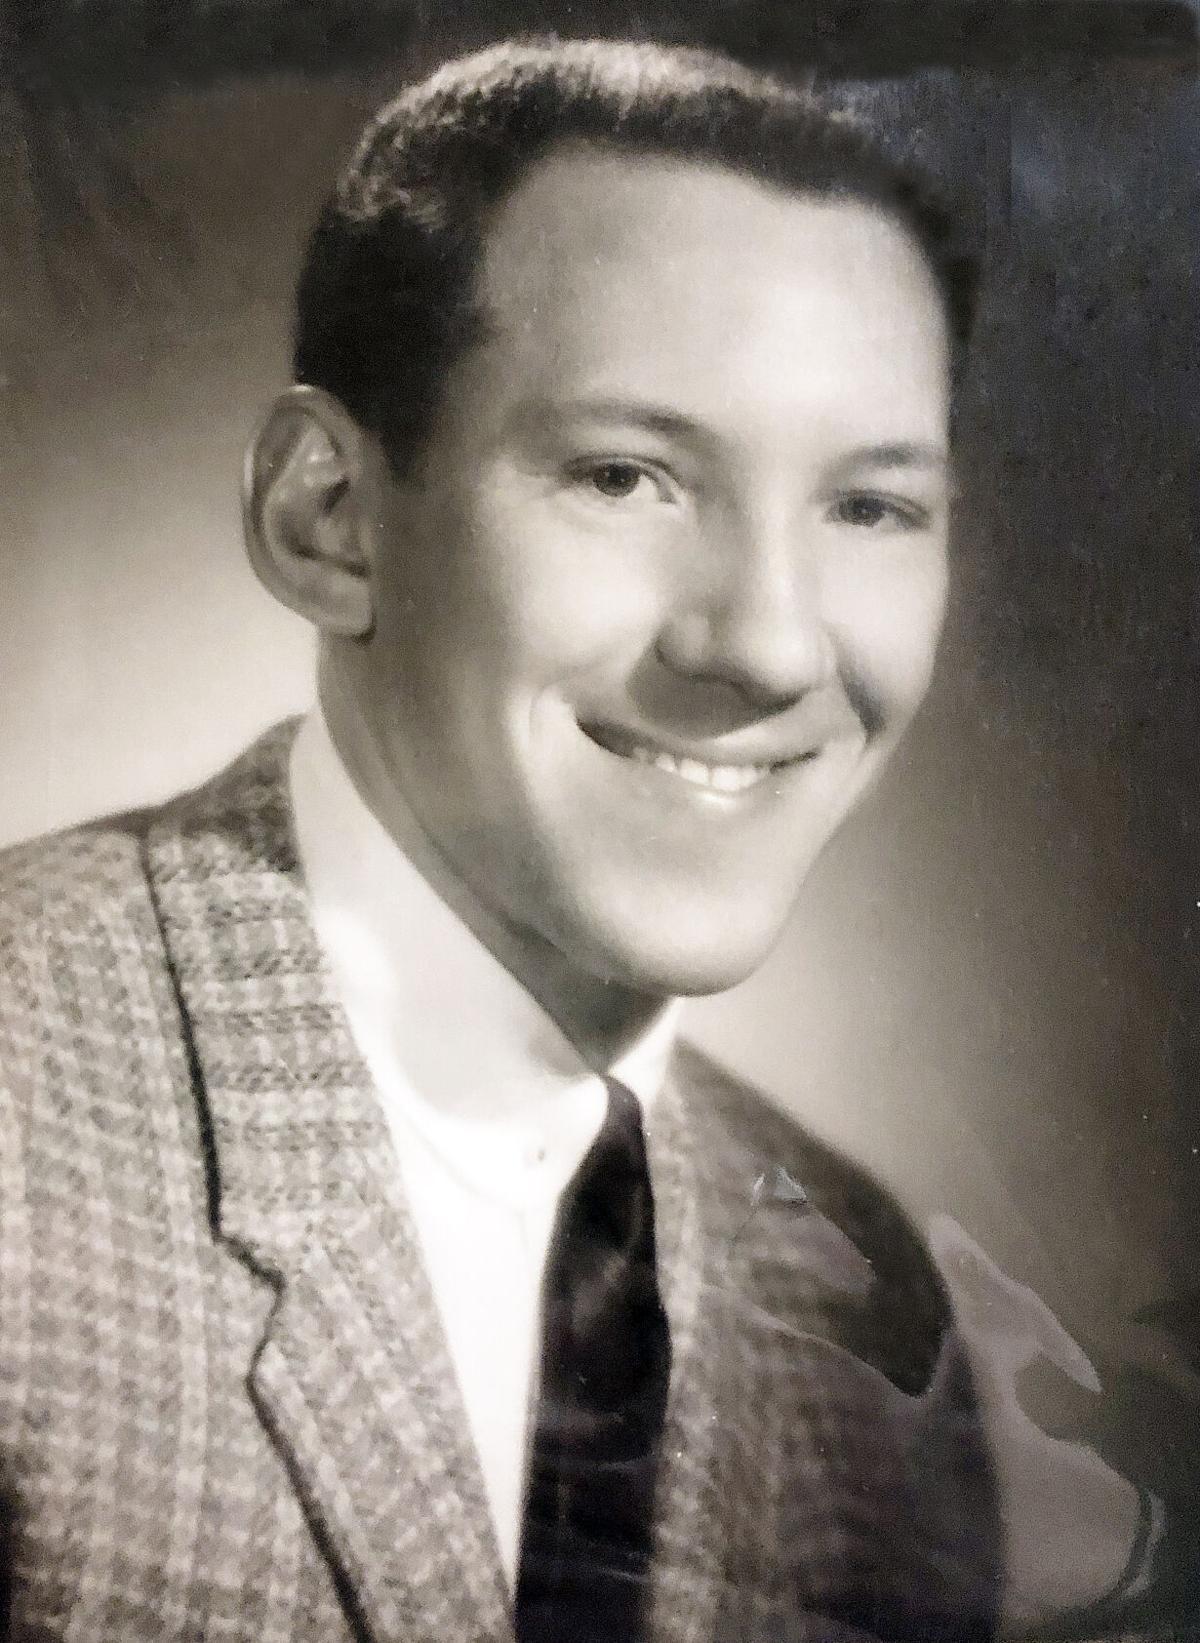 Larry Davis as a Mizzou student